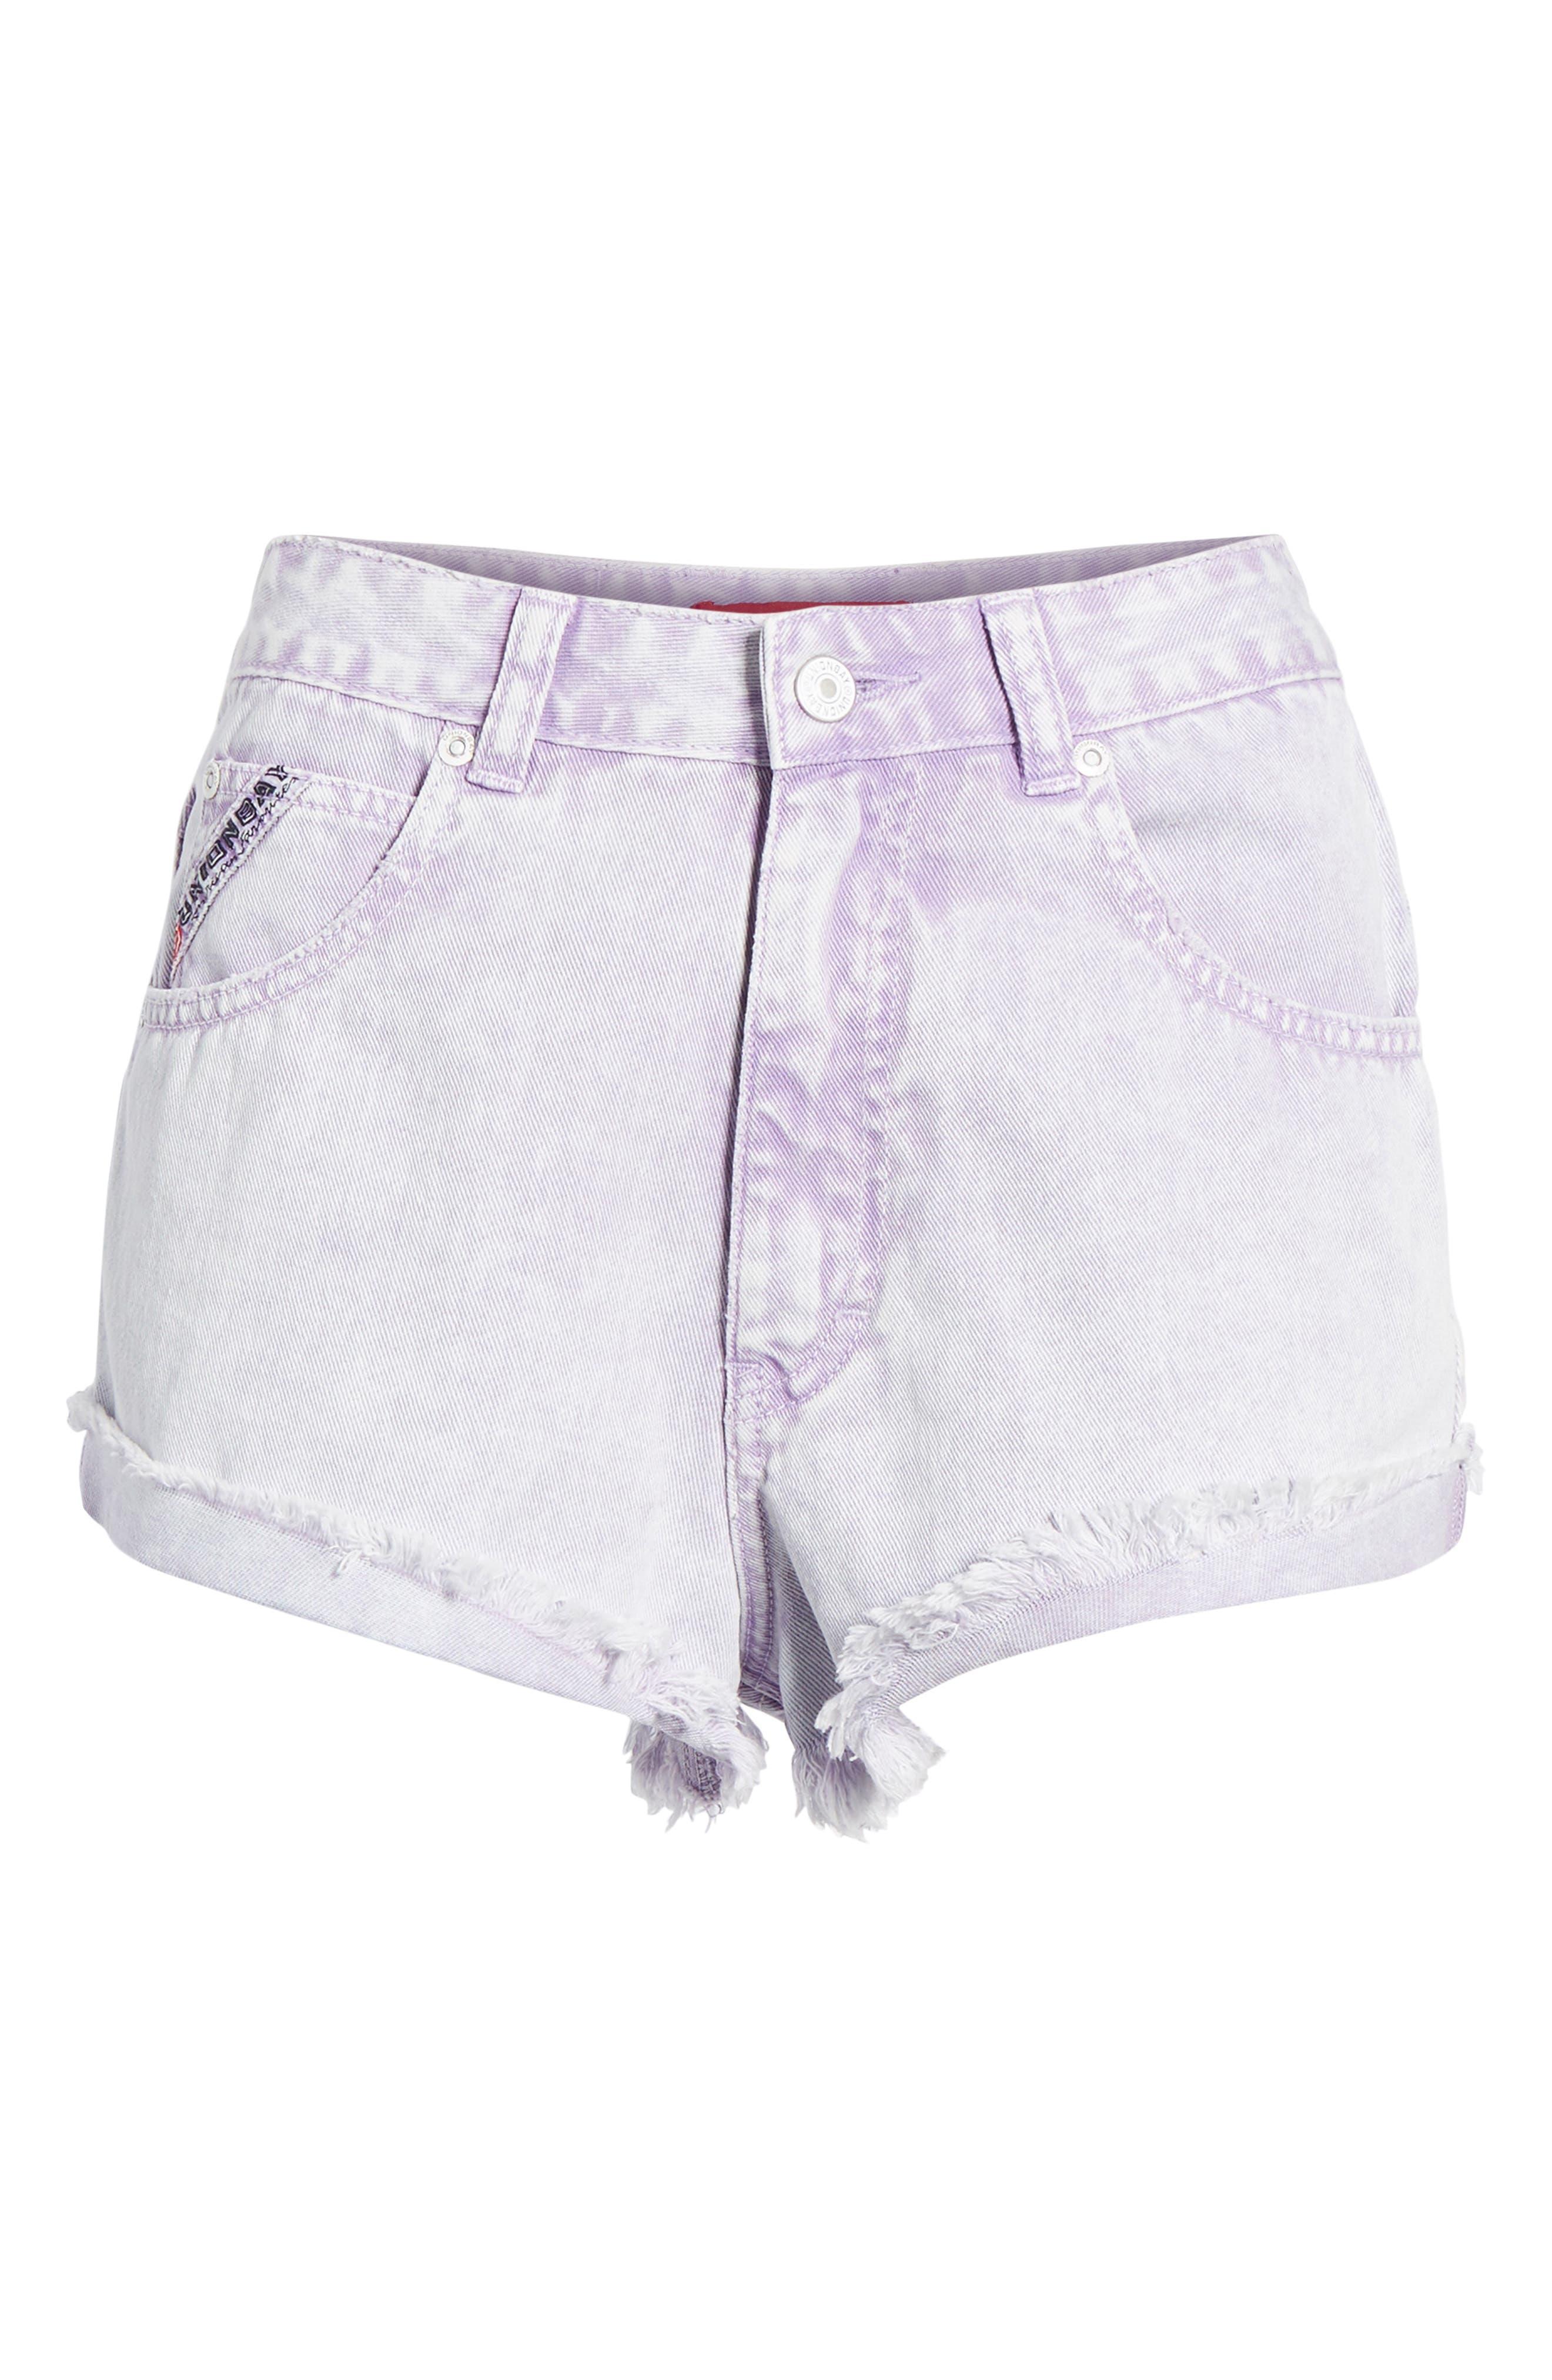 Unionbay Devo Acid Wash Denim Shorts,                             Alternate thumbnail 6, color,                             Ultra Lilac